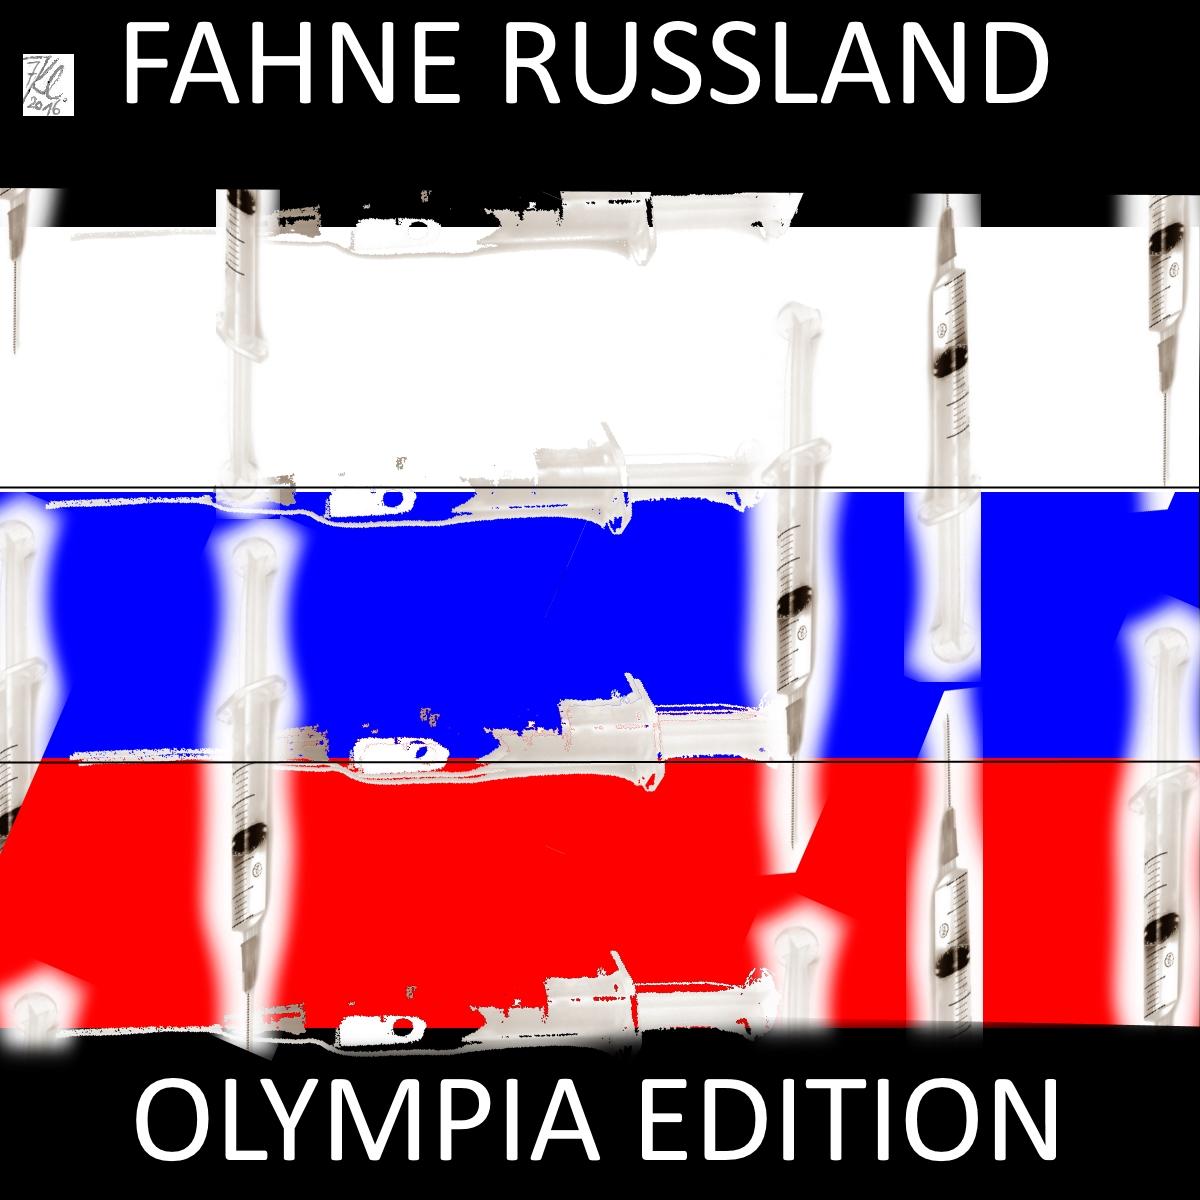 klausens-kunstwerk-fahne-russland-olympia-edition-25-7-2016